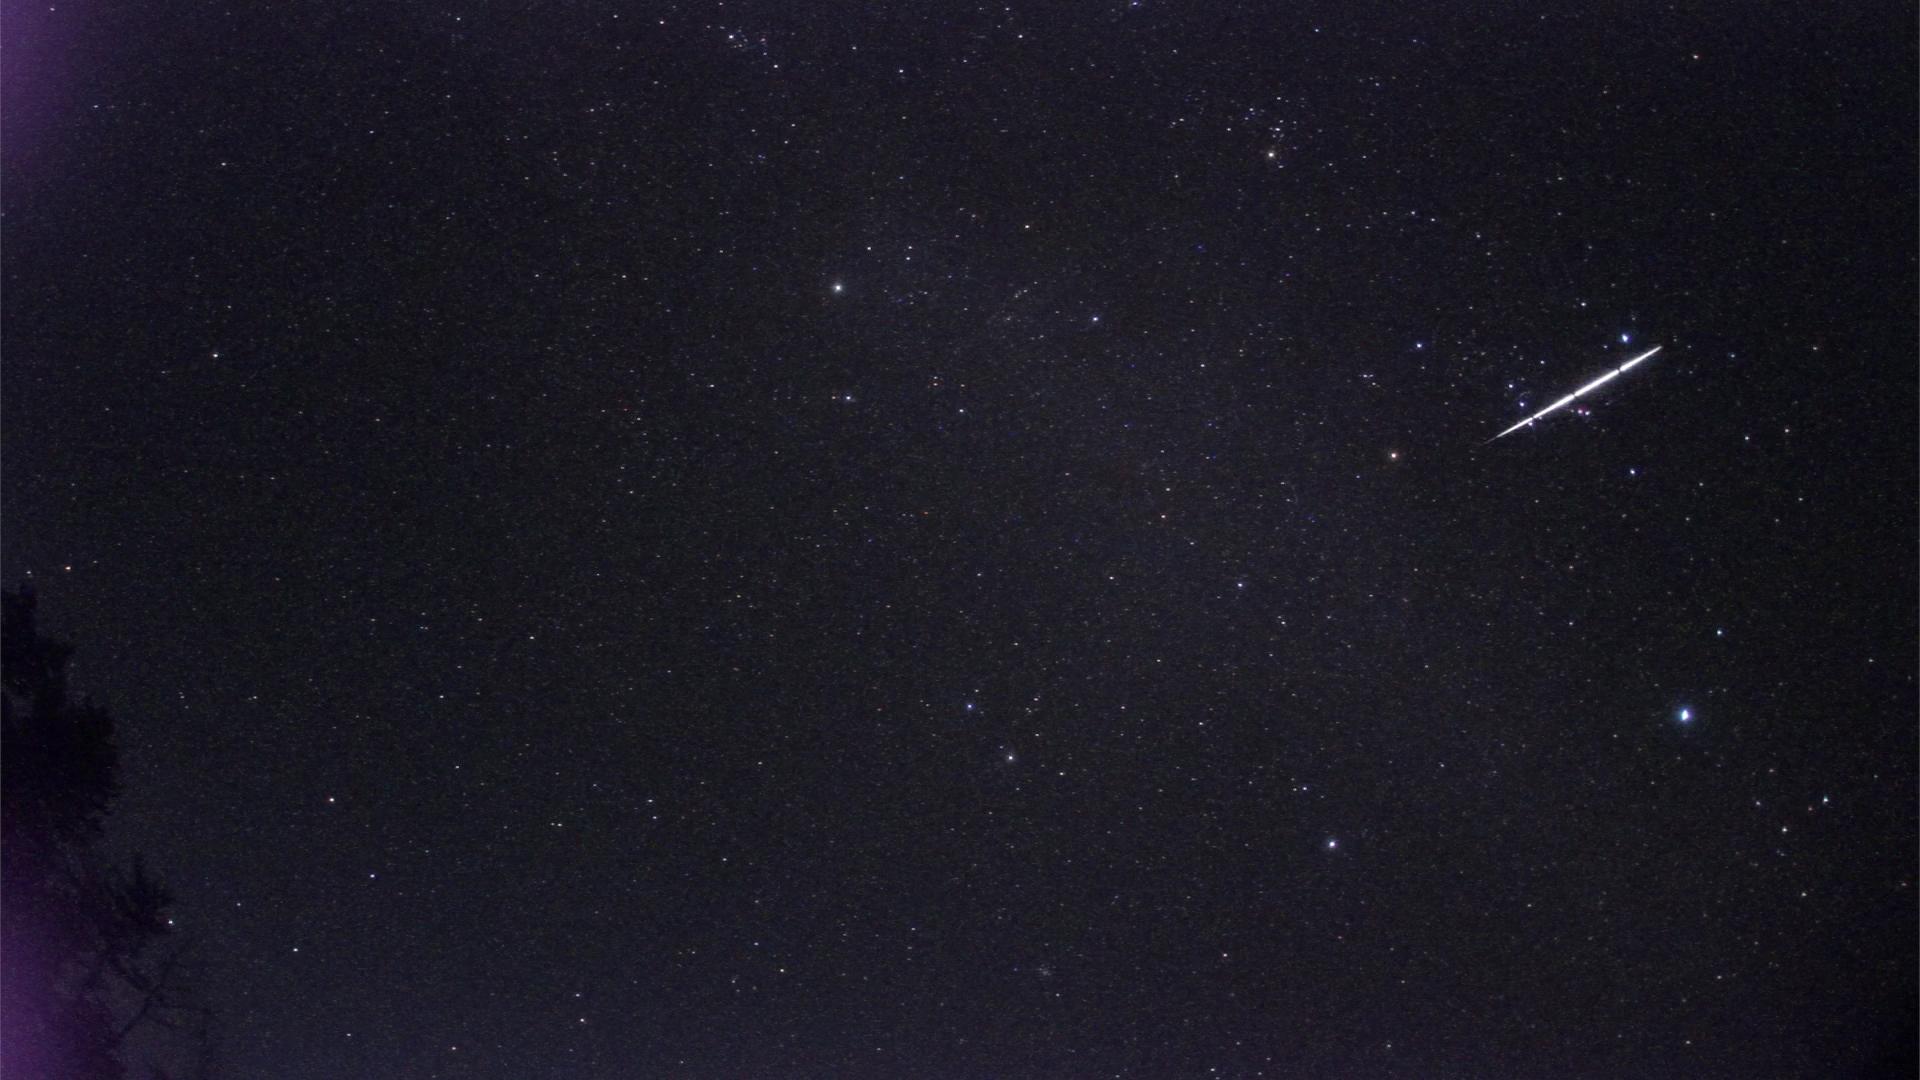 f:id:snct-astro:20201218224803j:plain